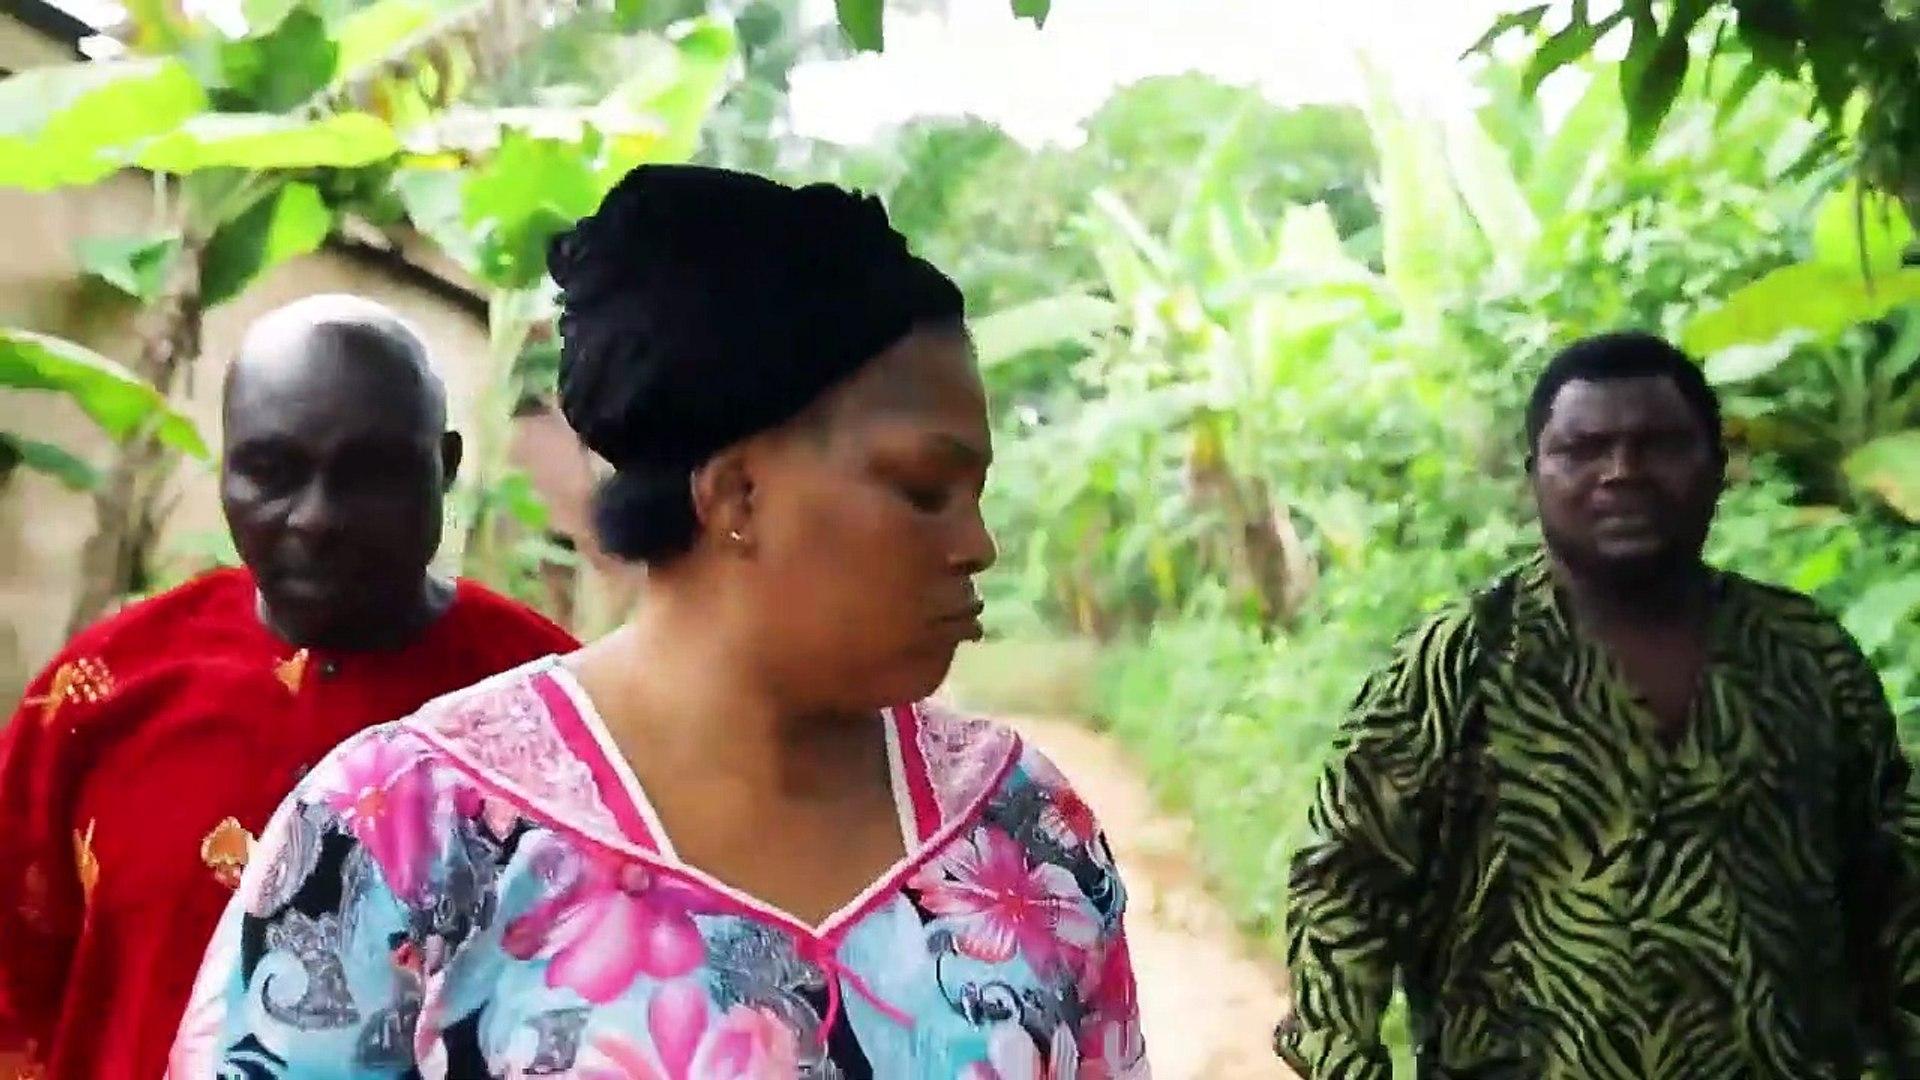 HOW MY HUSBAND'S BROTHERS TURNED ME MAD{MAD WIDOWS 3}- 2019 NIGERIAN MOVIES